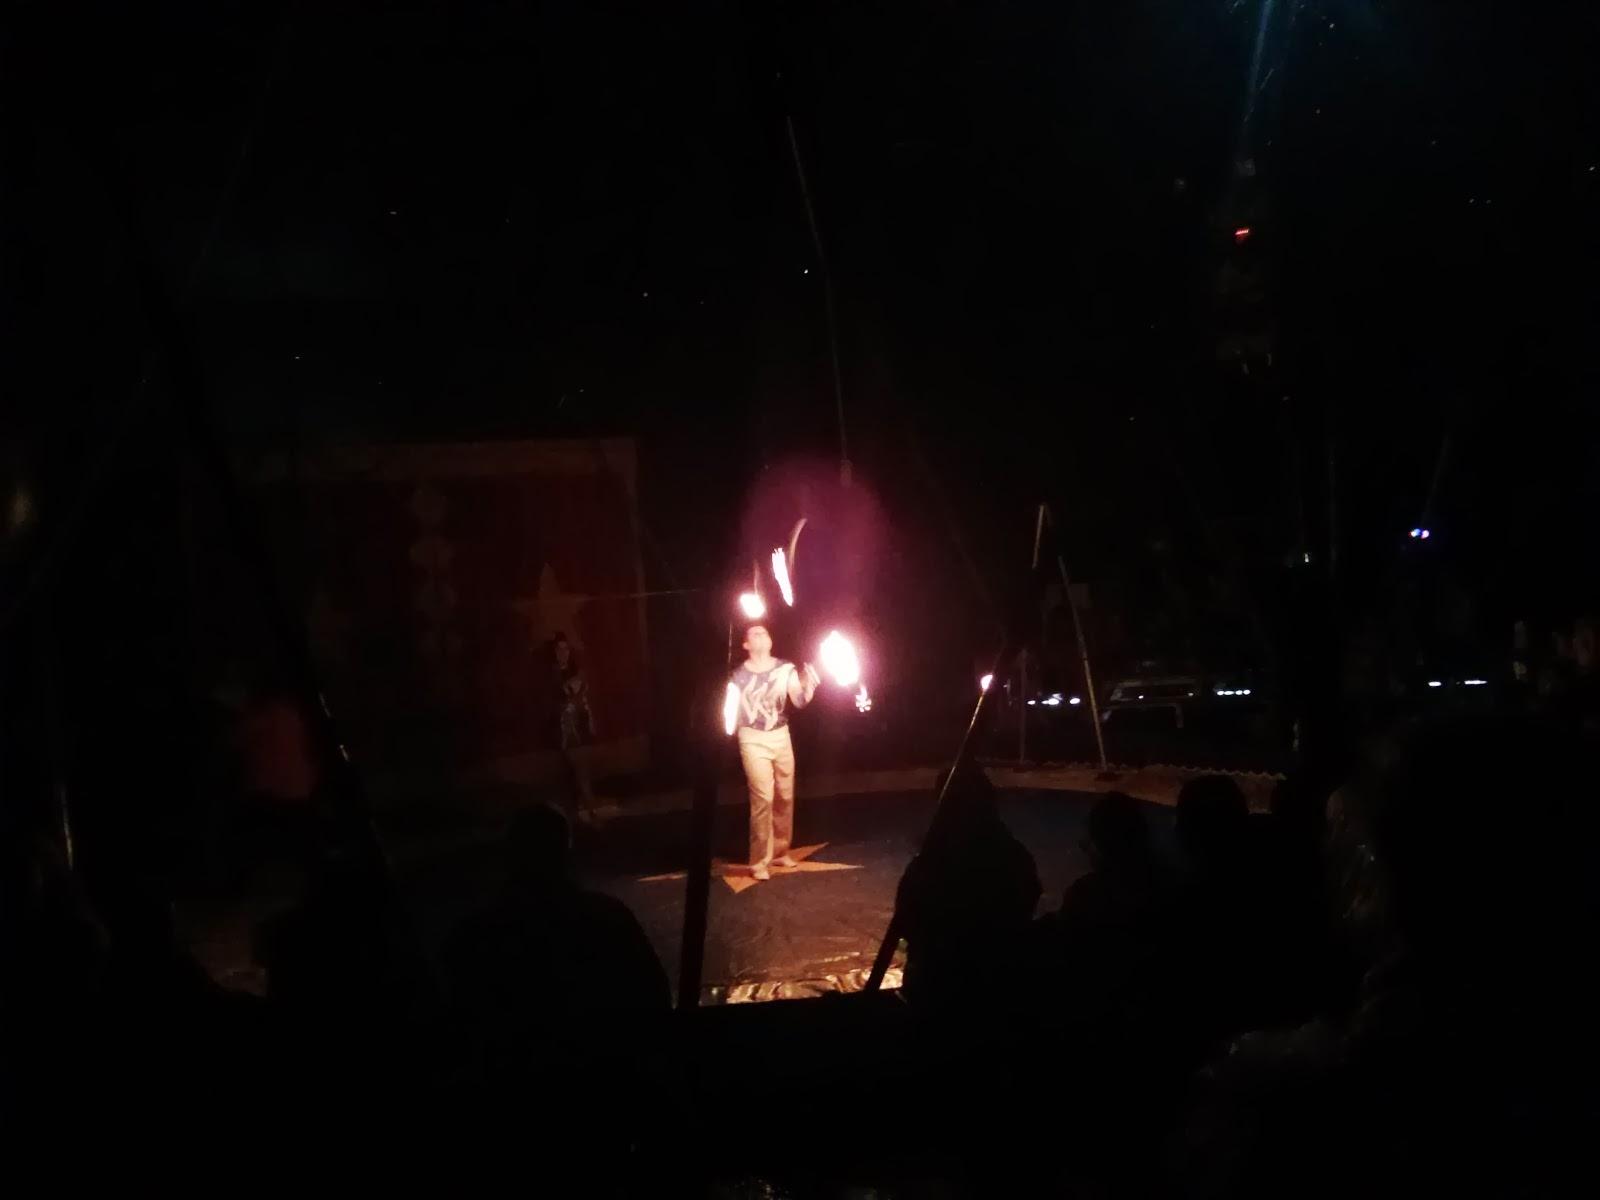 Juggler juggling fire